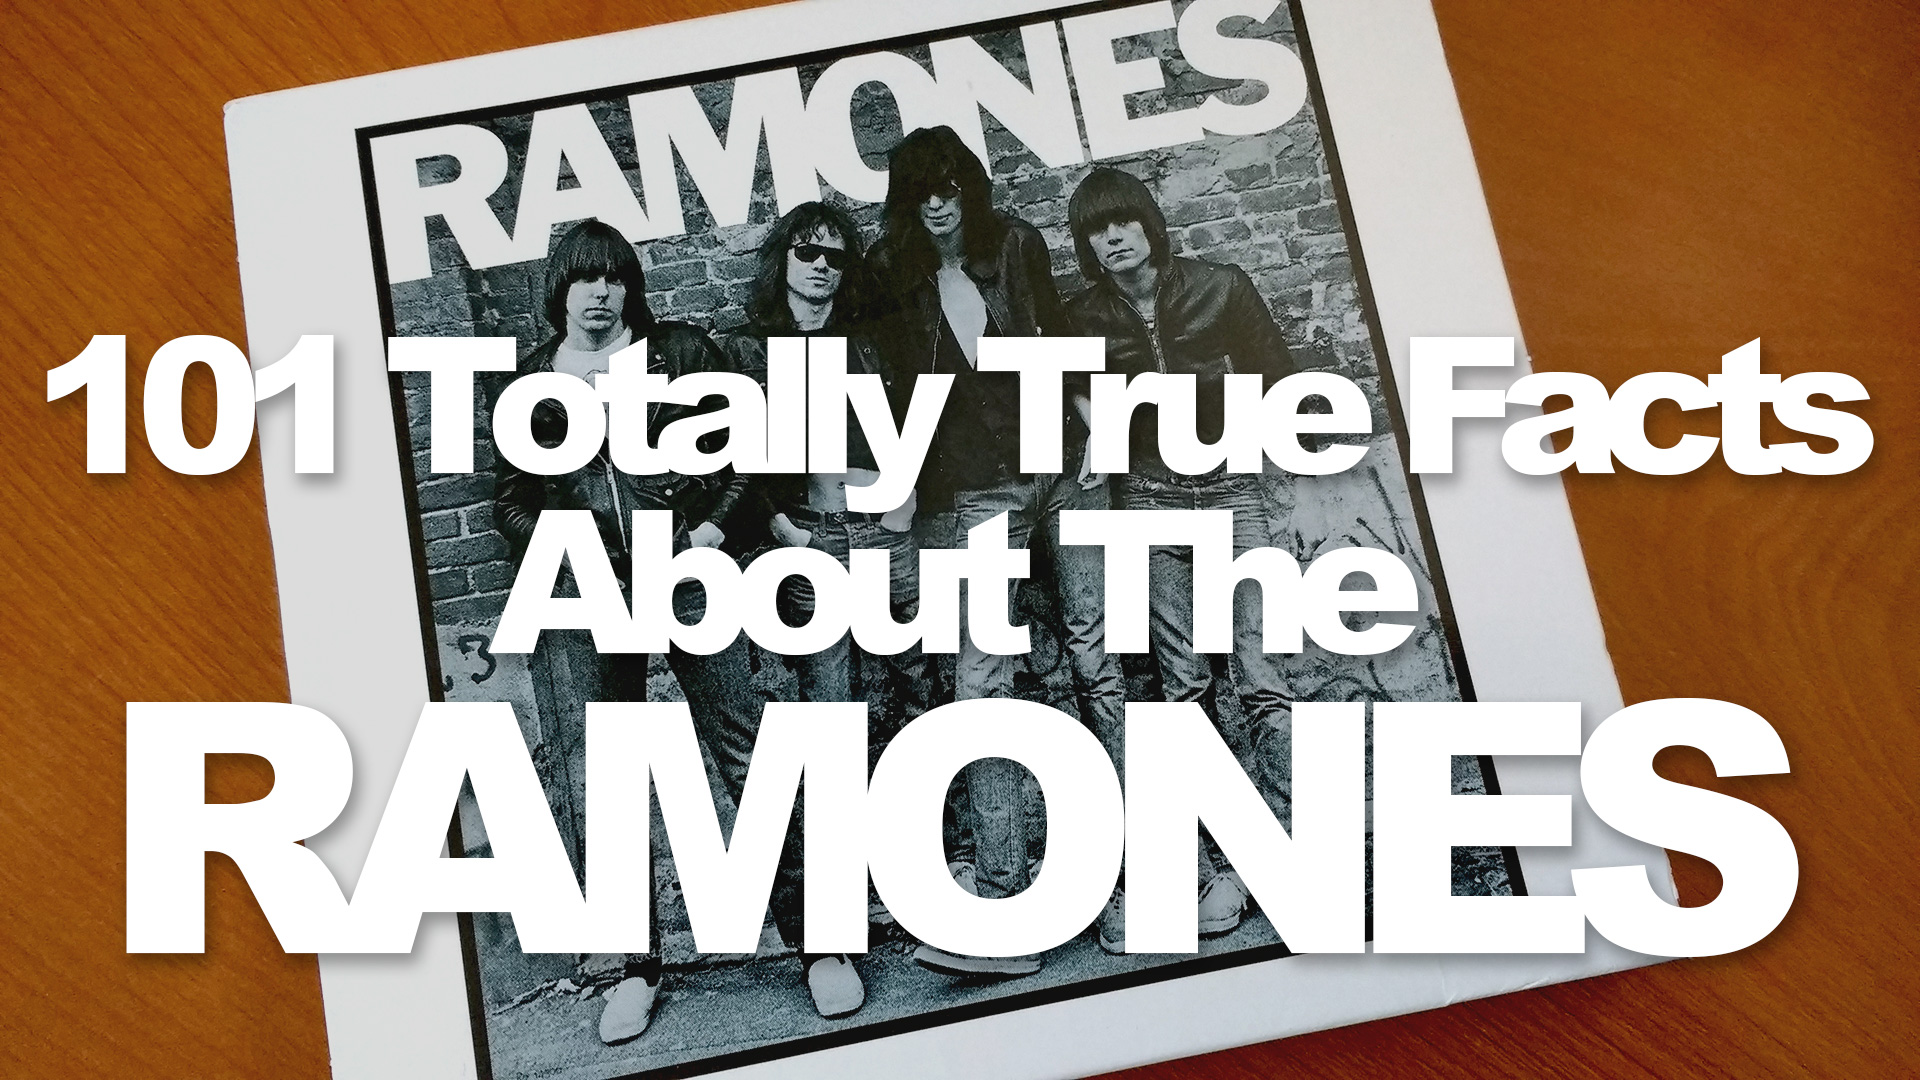 Ramones Facts